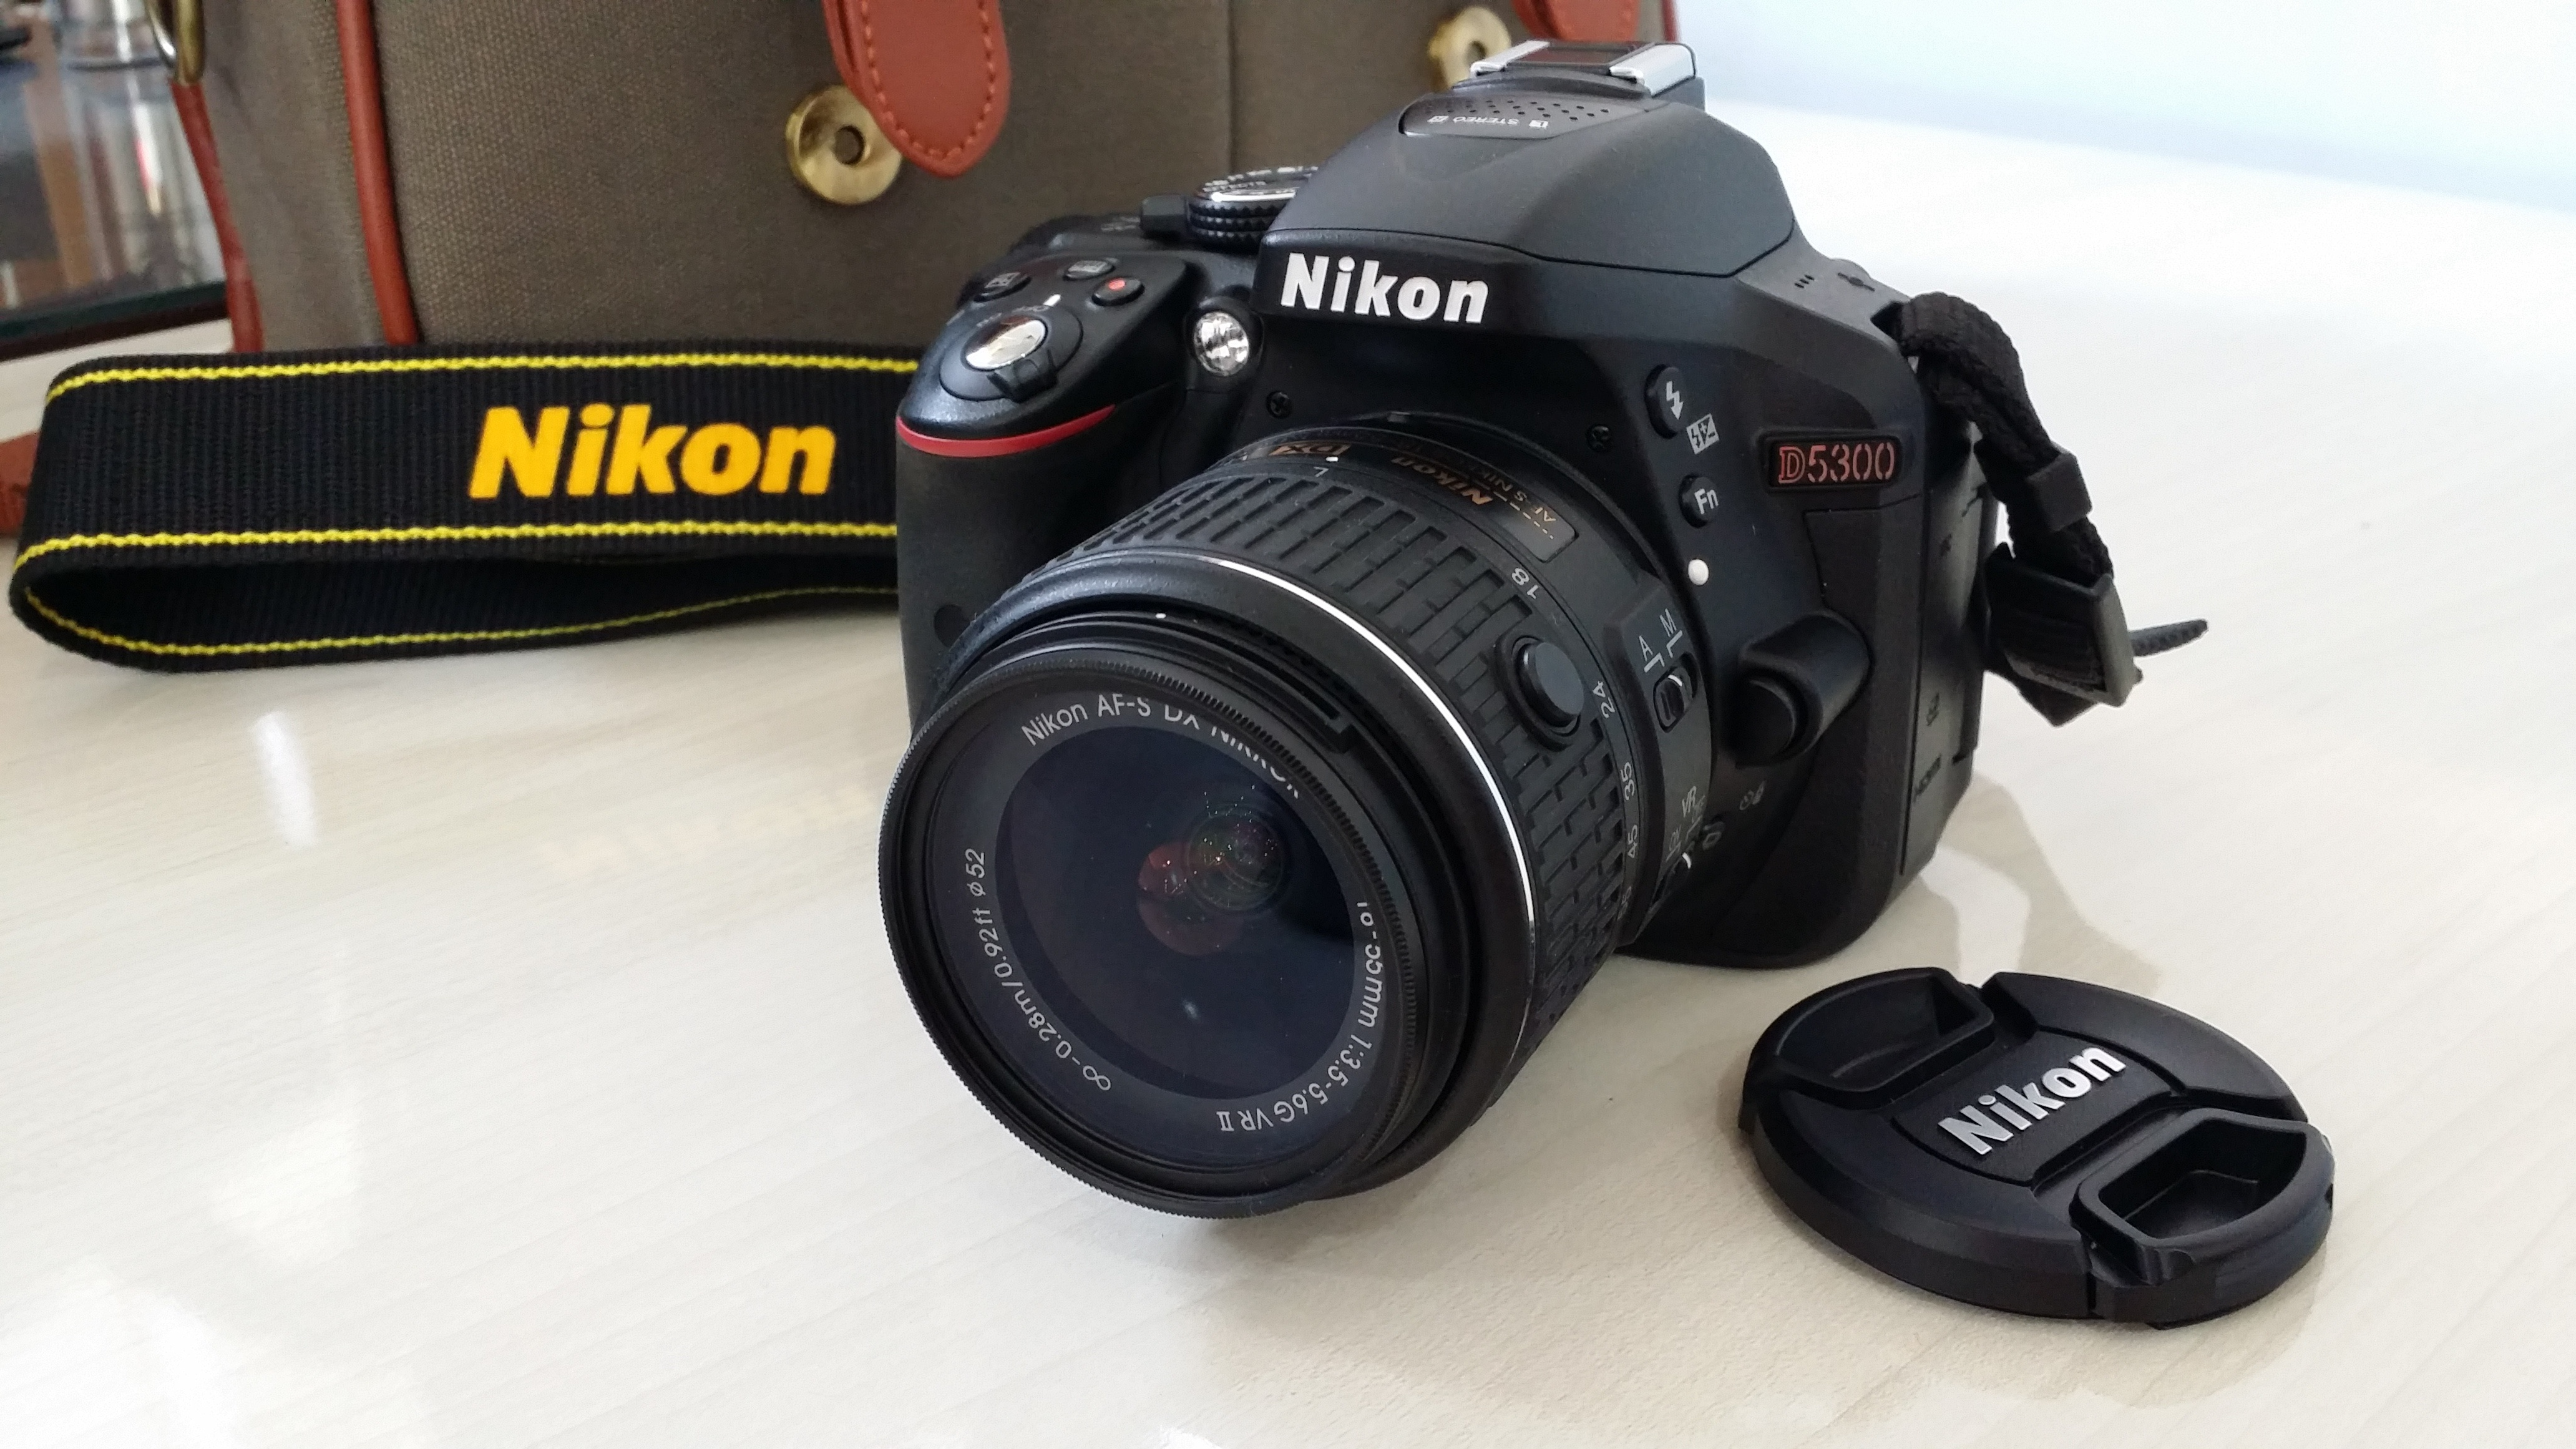 Nikon Camera Wallpaper 4128x2322 Wallpaper Teahub Io